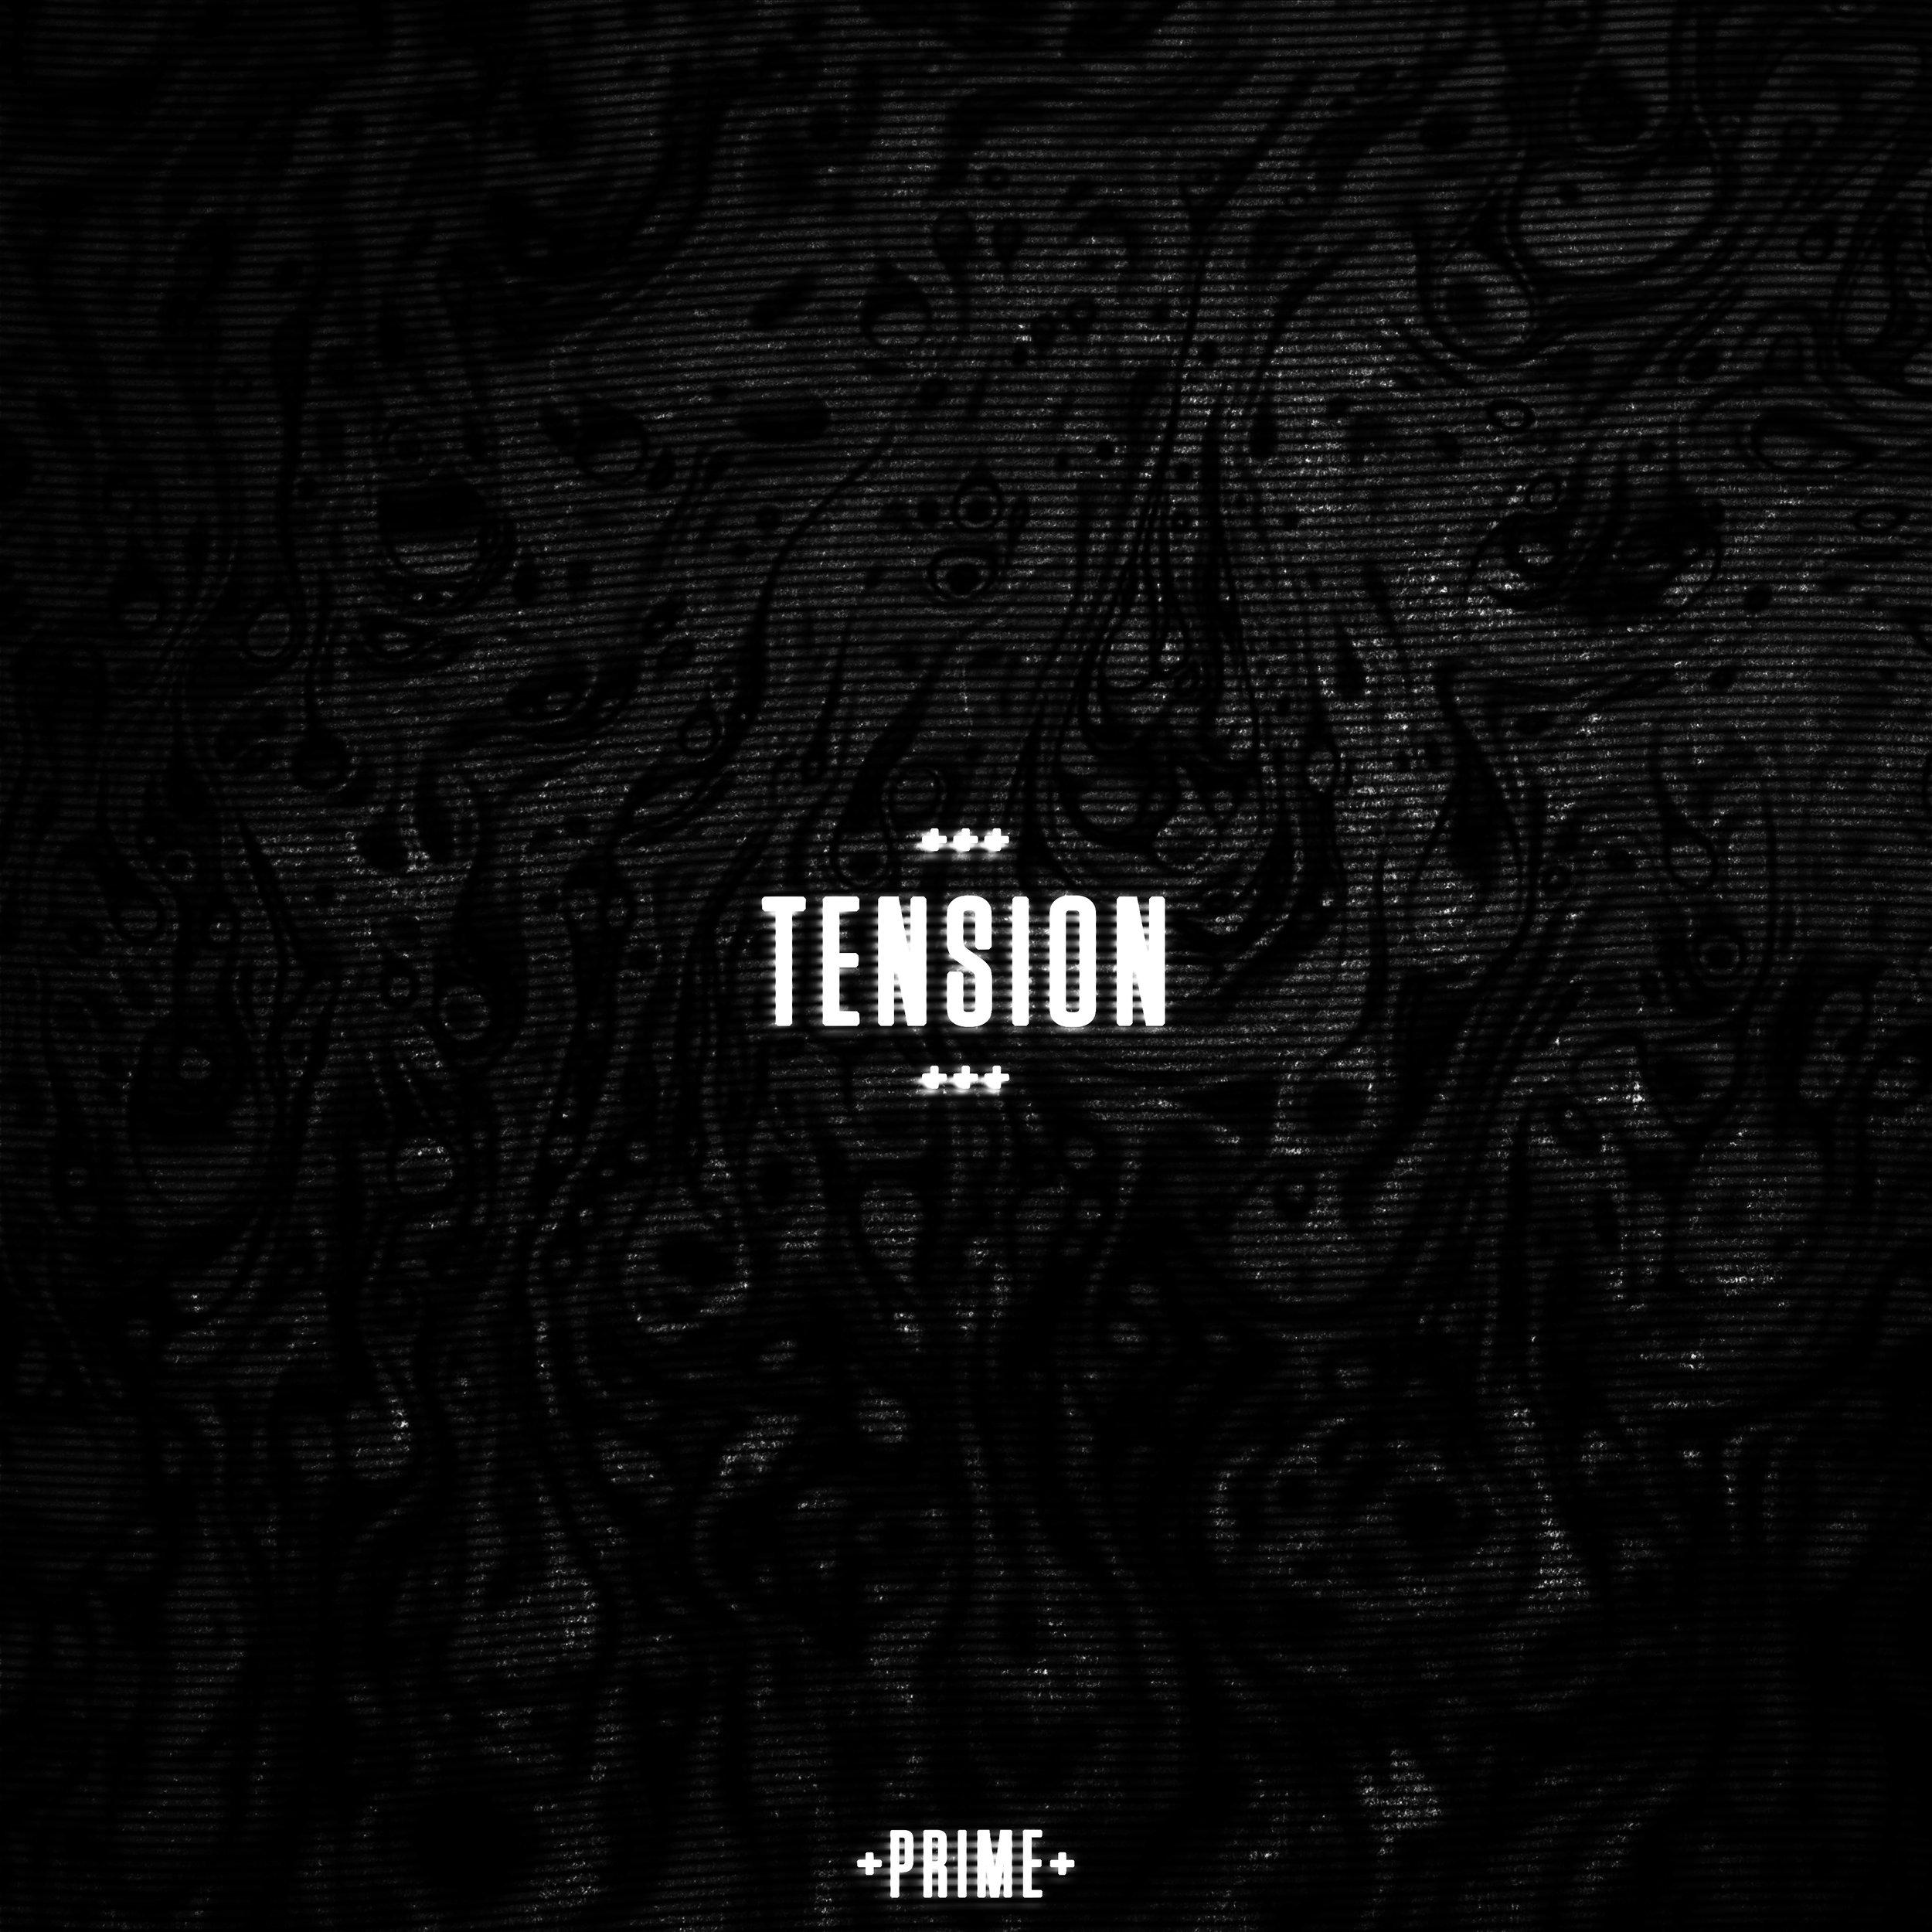 tension-artwork.jpg